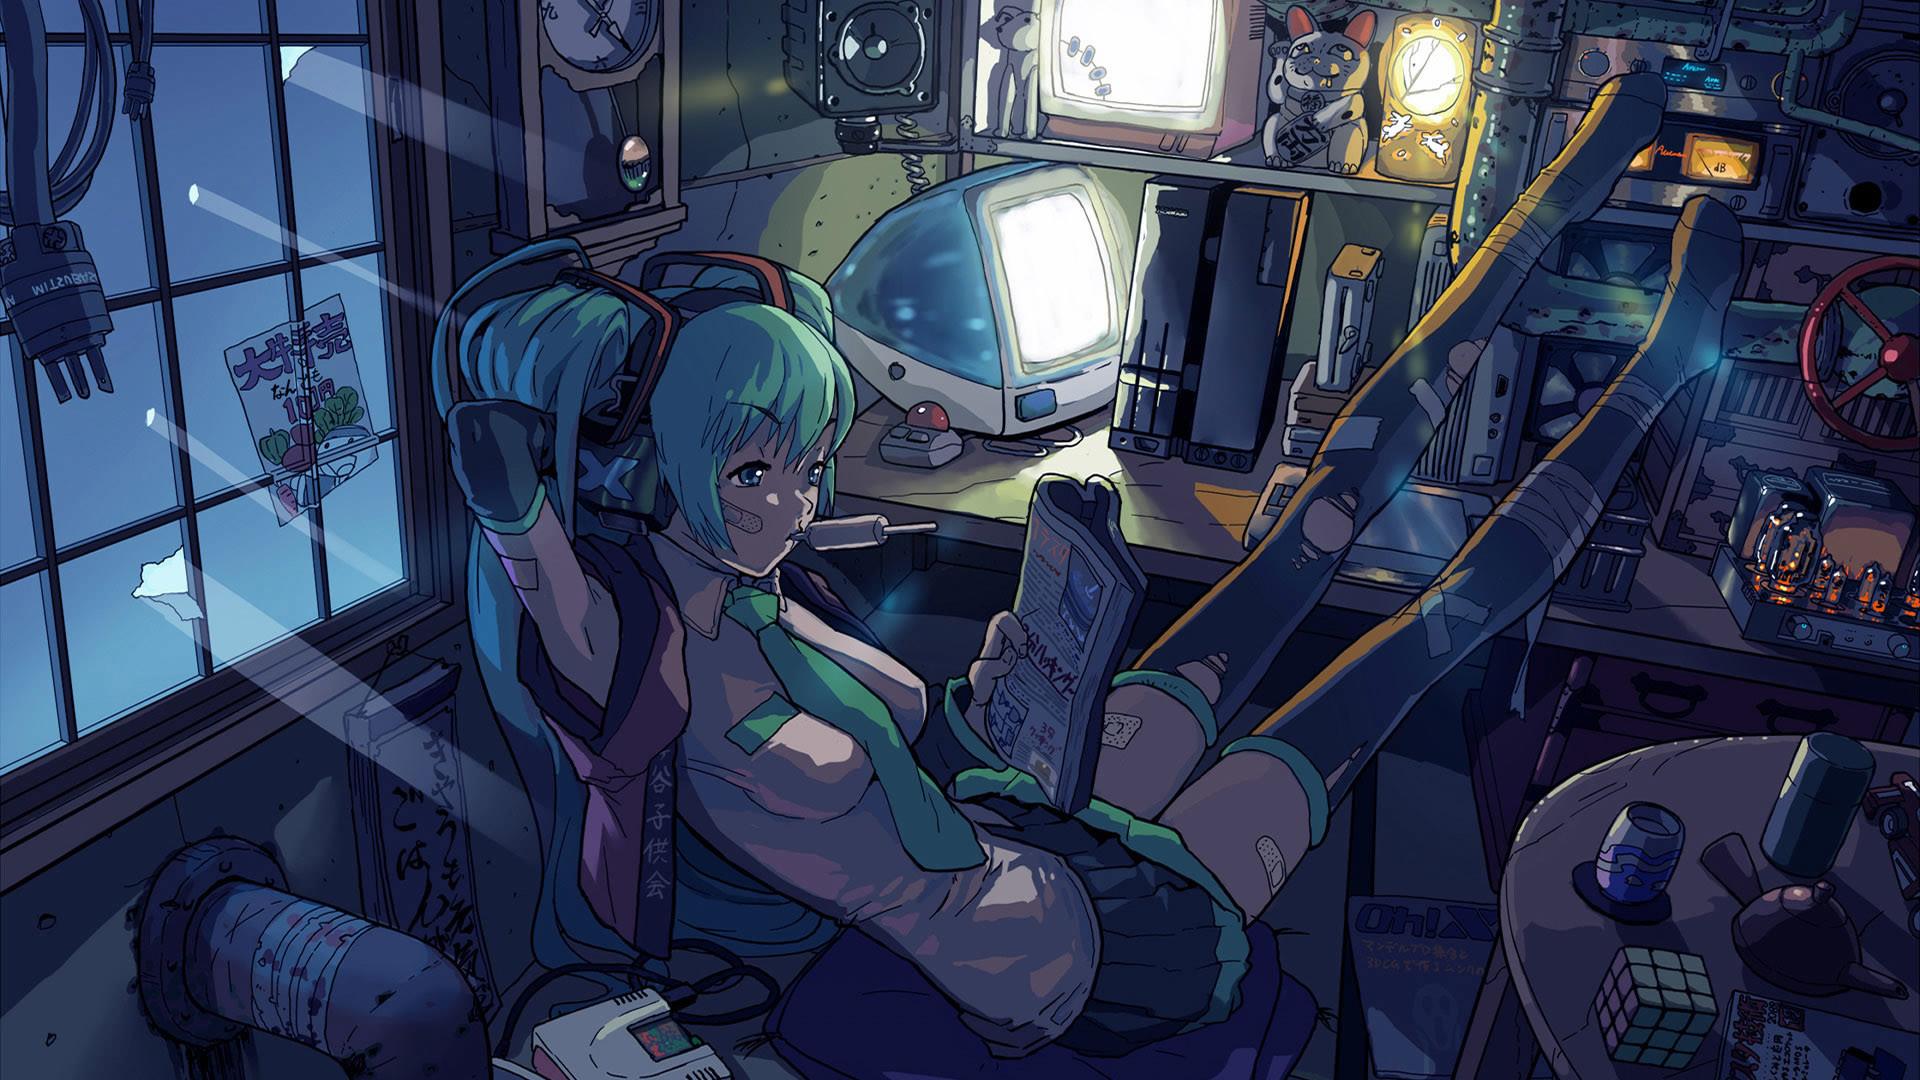 anime_wallpaper   Coolvibe – Digital ArtCoolvibe – Digital Art